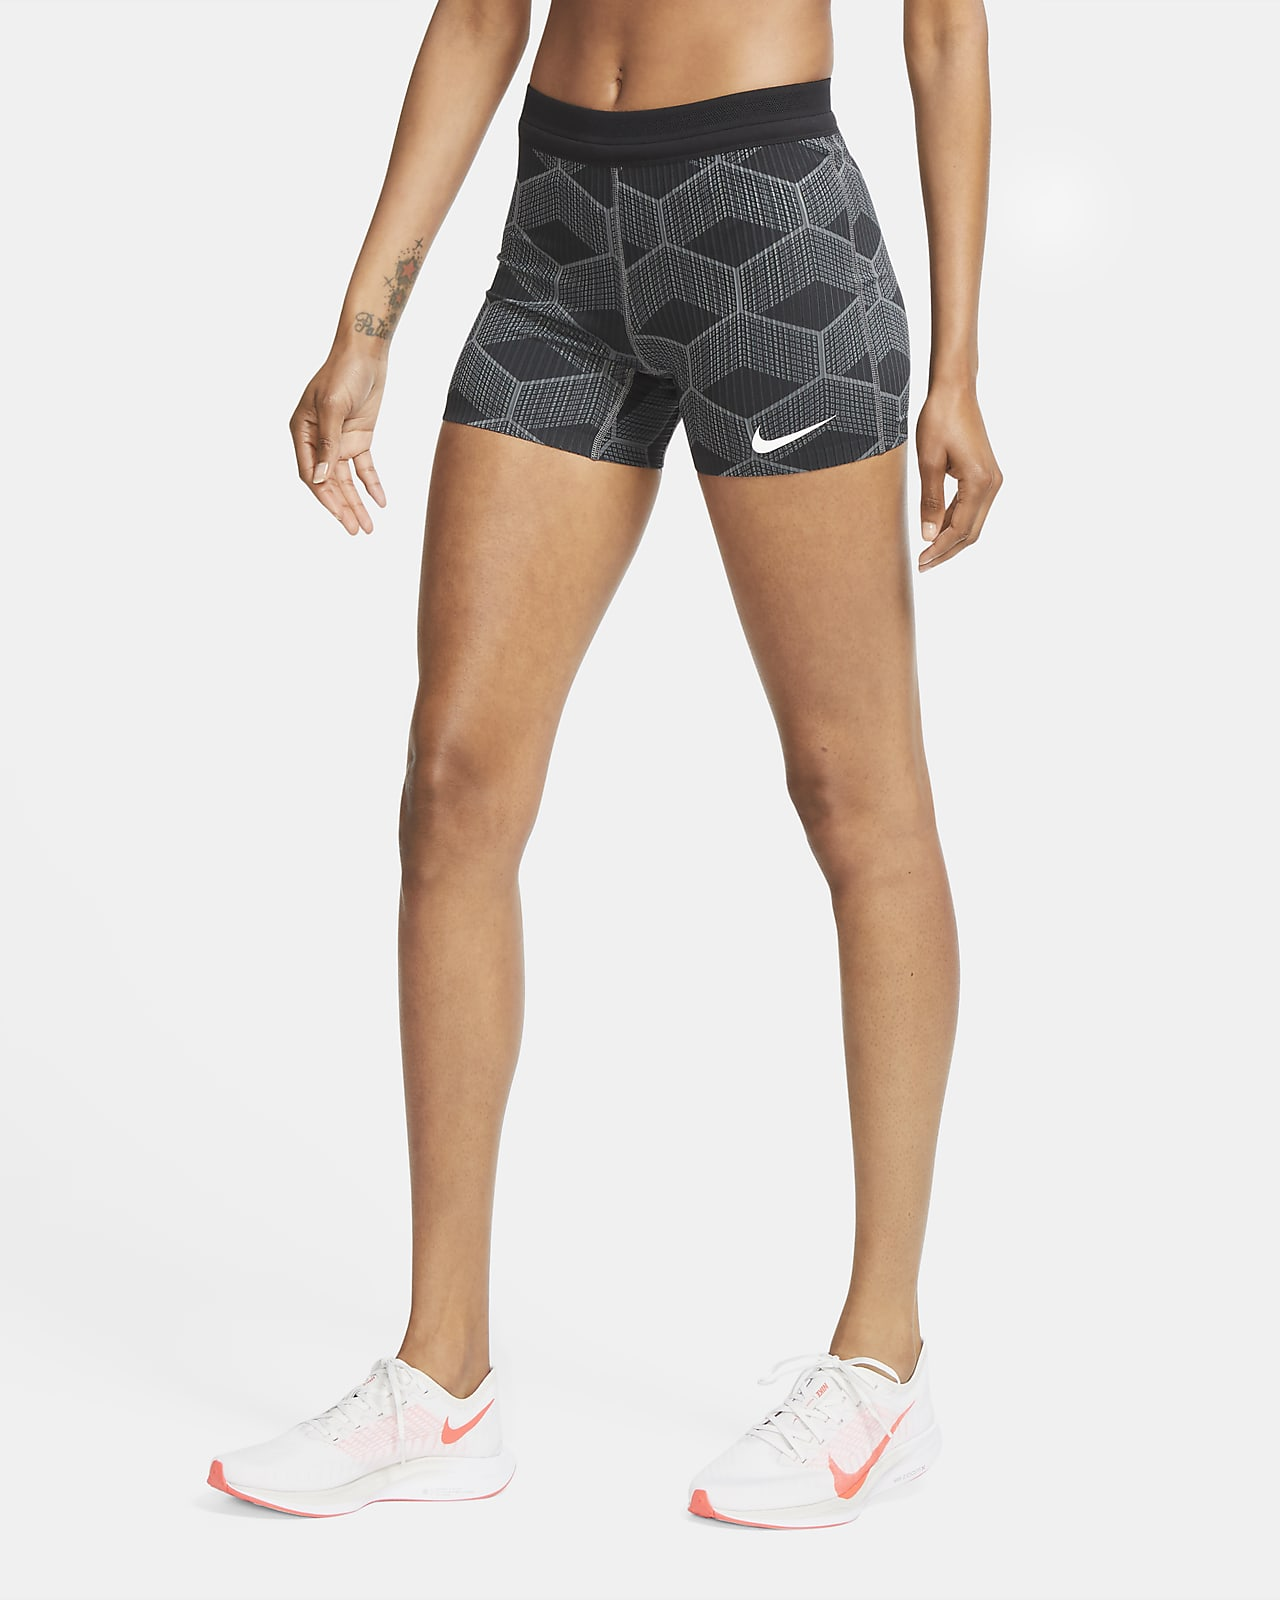 Calções de running justos Nike Dri-FIT ADV Team Kenya AeroSwift para mulher